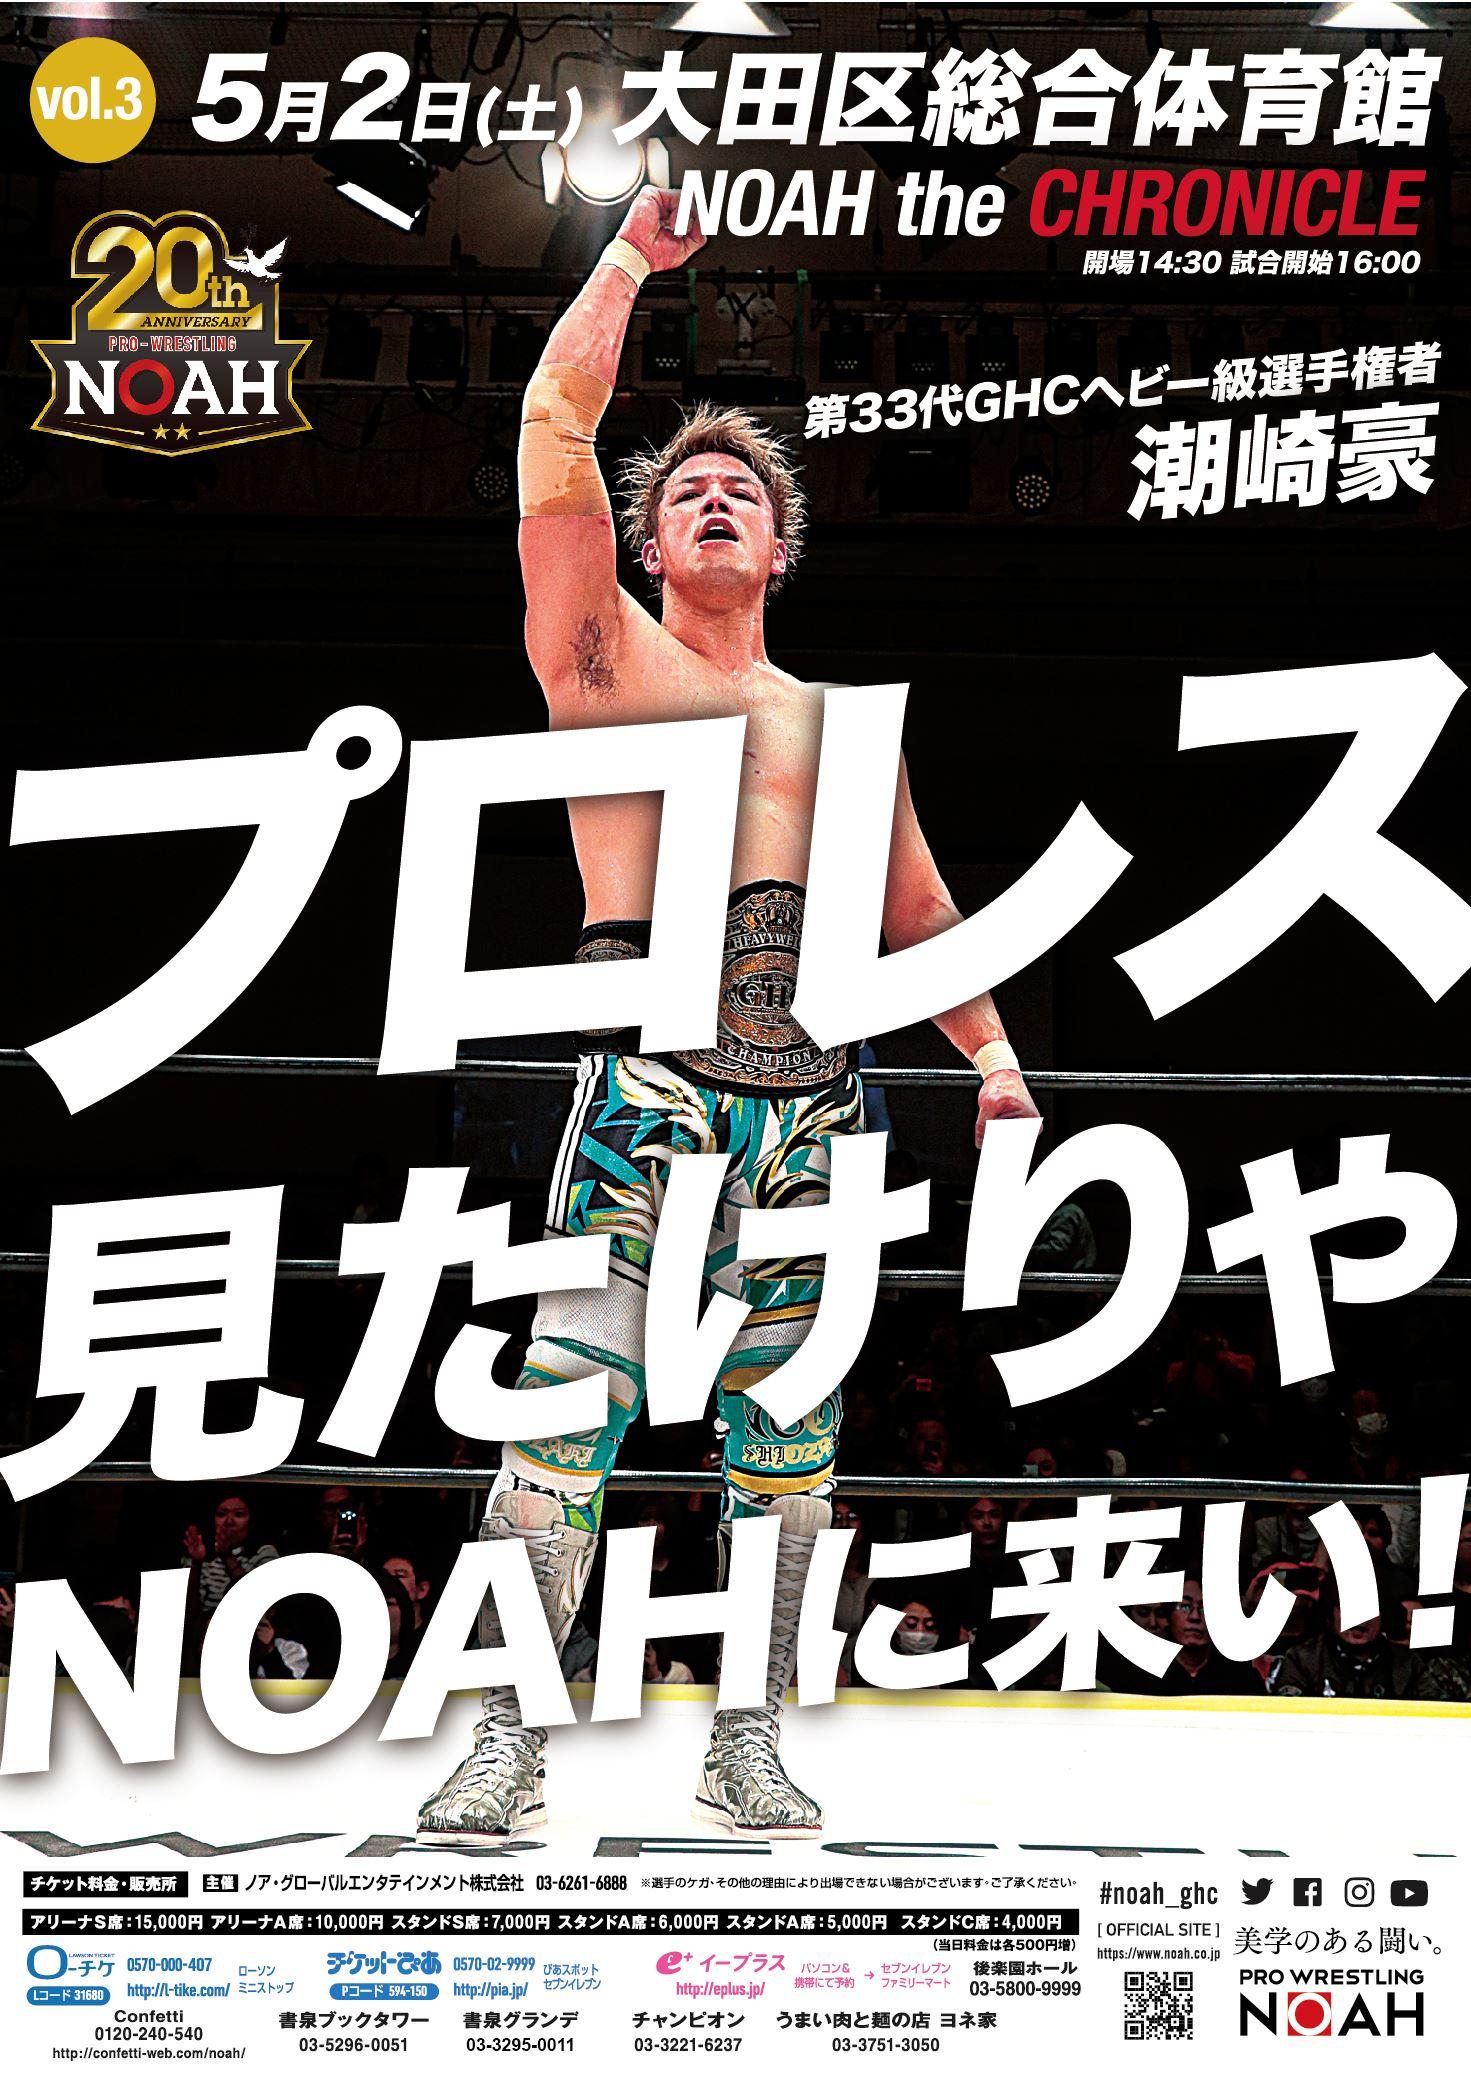 PRO WRESTLING NOAH 20th ANNIVERSARY NOAH the CHRONICLE vol.3 - Ota tournament -